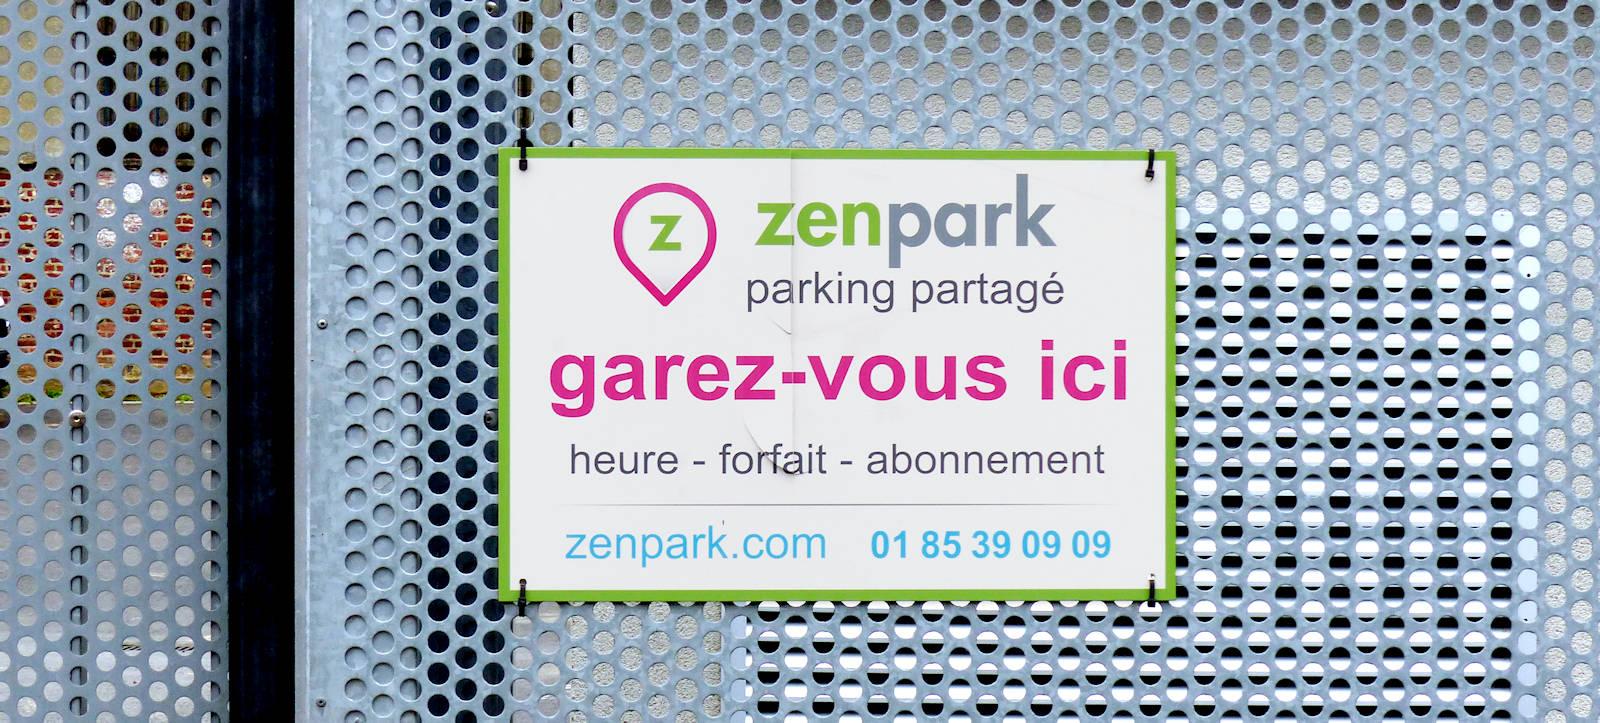 Parking Tourcoing Zenpark Victoire, rue Sasselange.